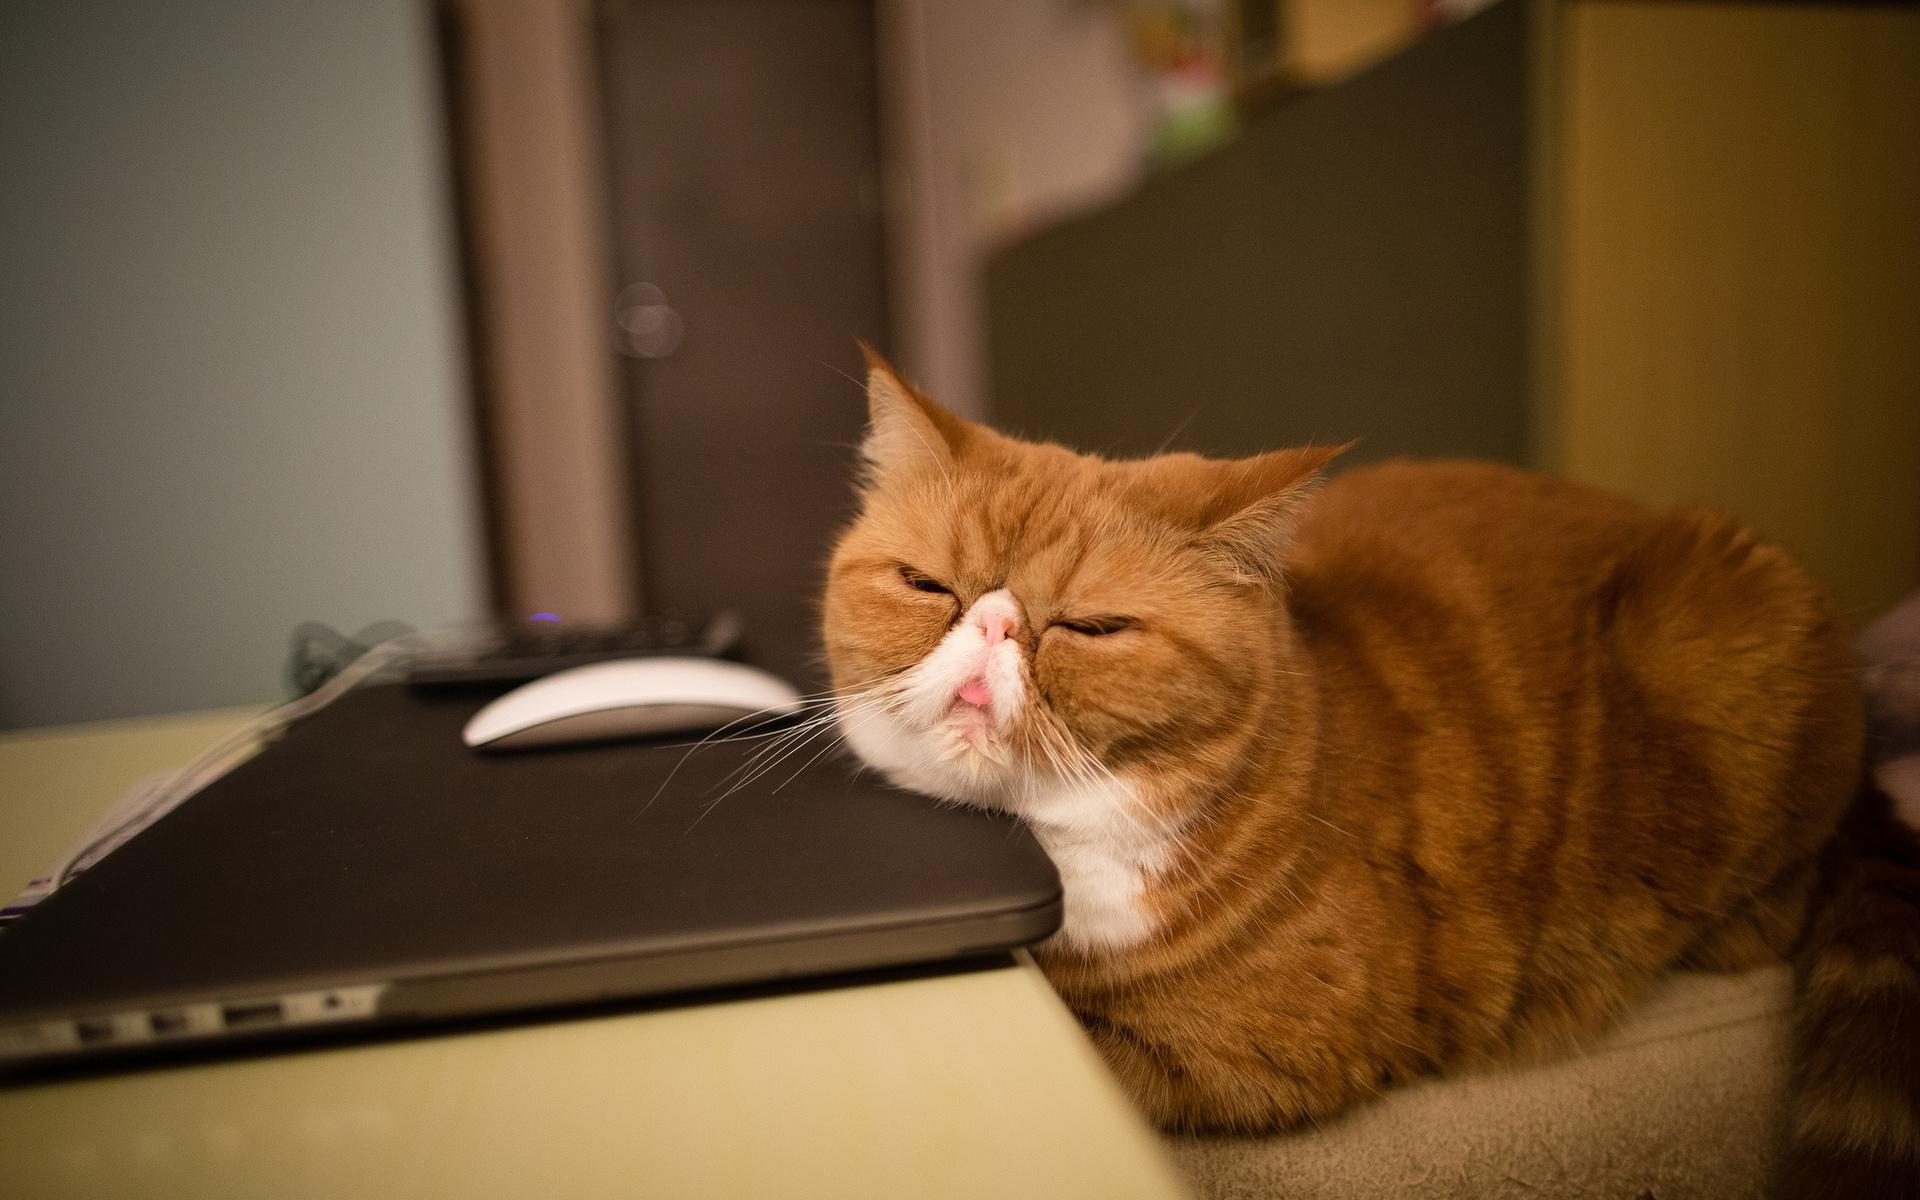 Фото кошек на компьютере